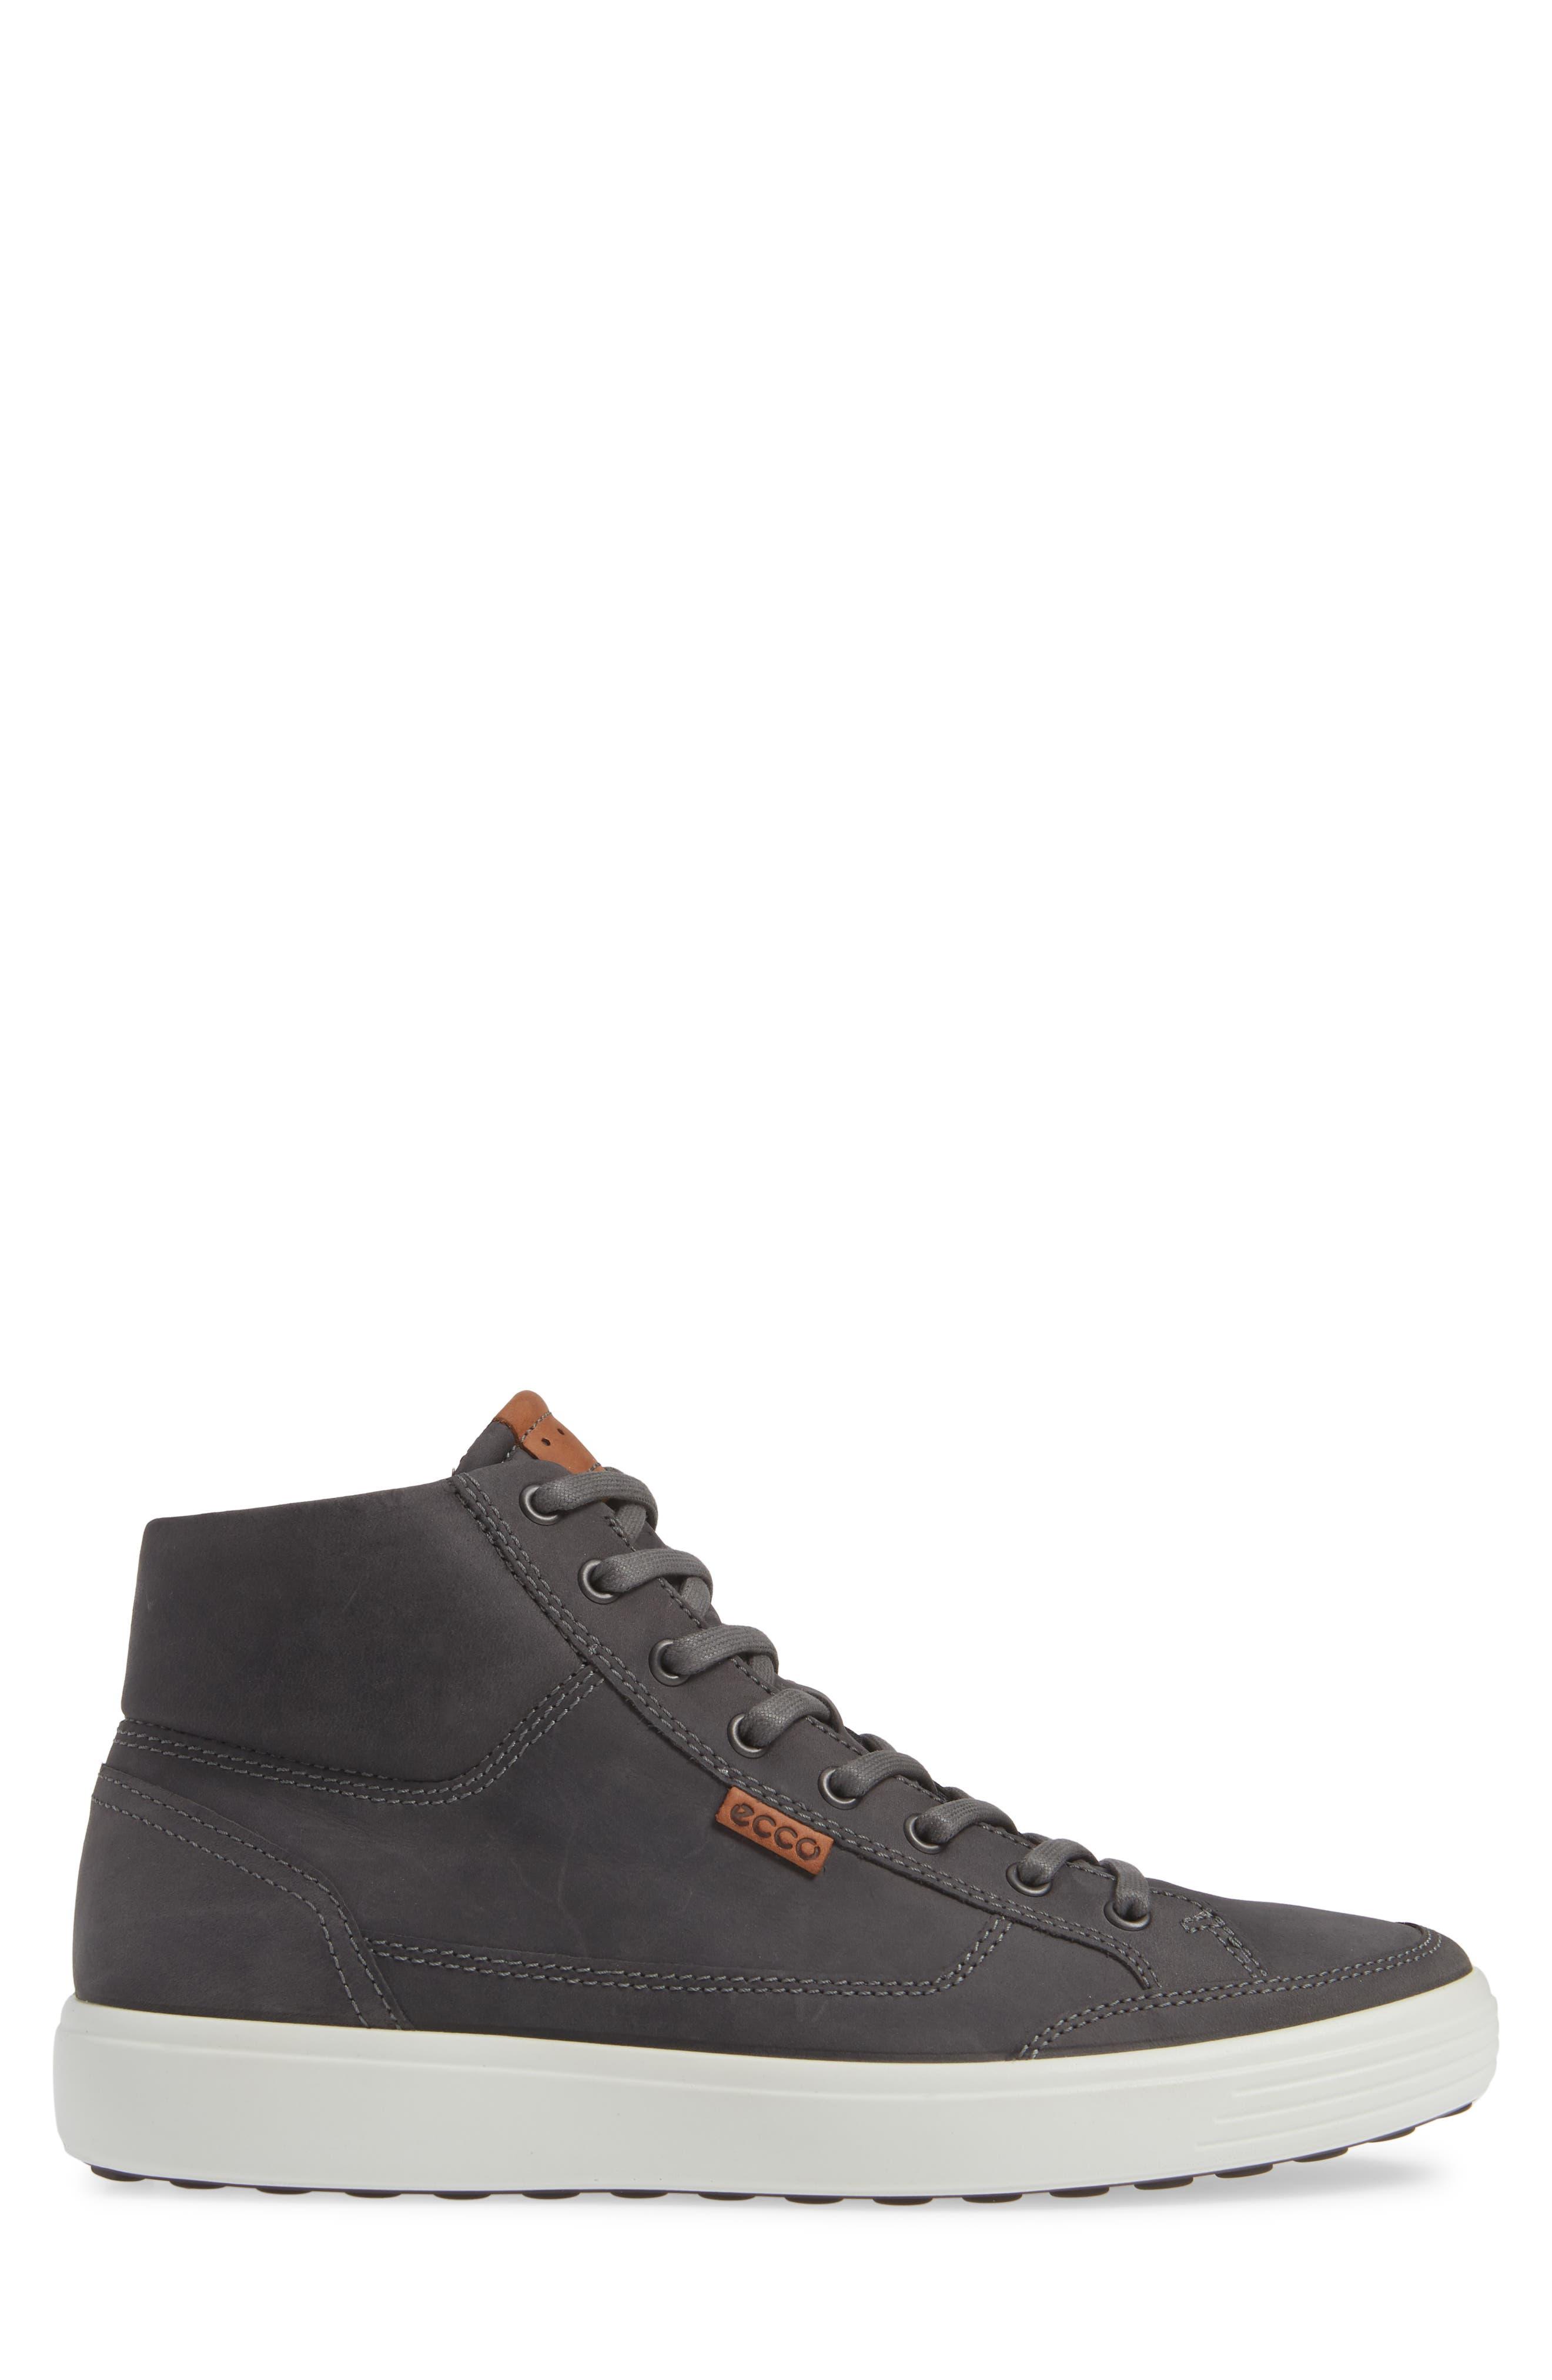 Soft 7 Sneaker,                             Alternate thumbnail 3, color,                             TITANIUM LEATHER